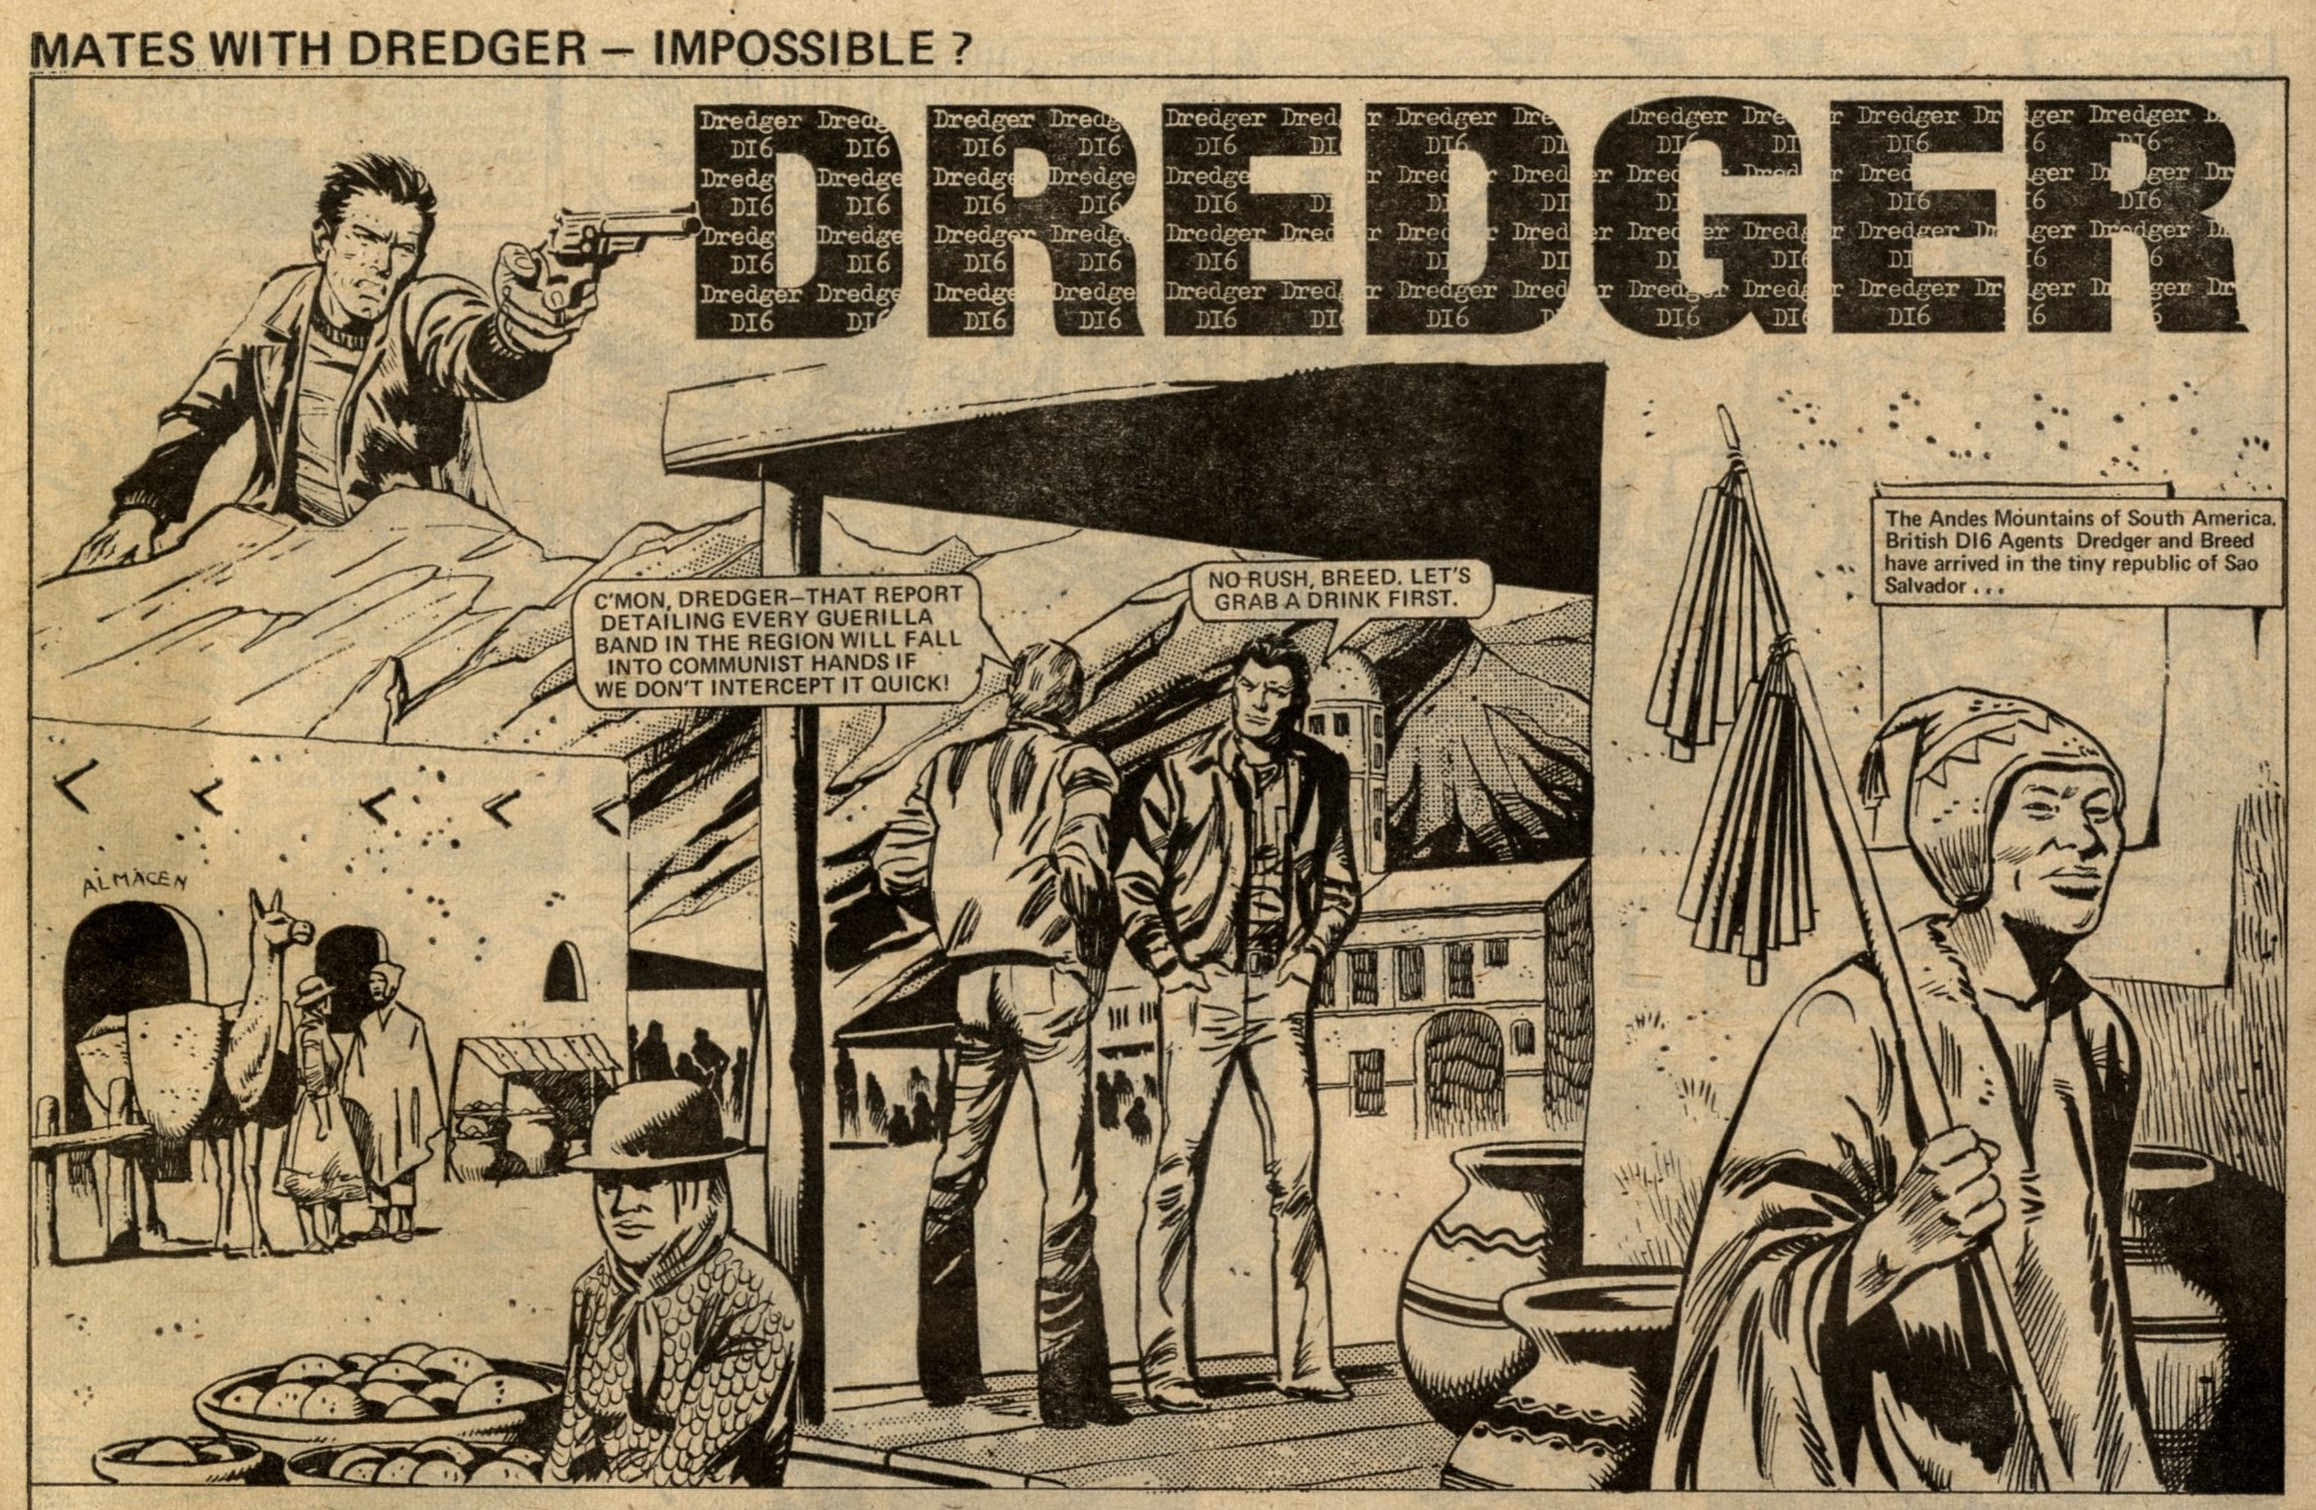 Dredger: Ricardo Villagran (artist)